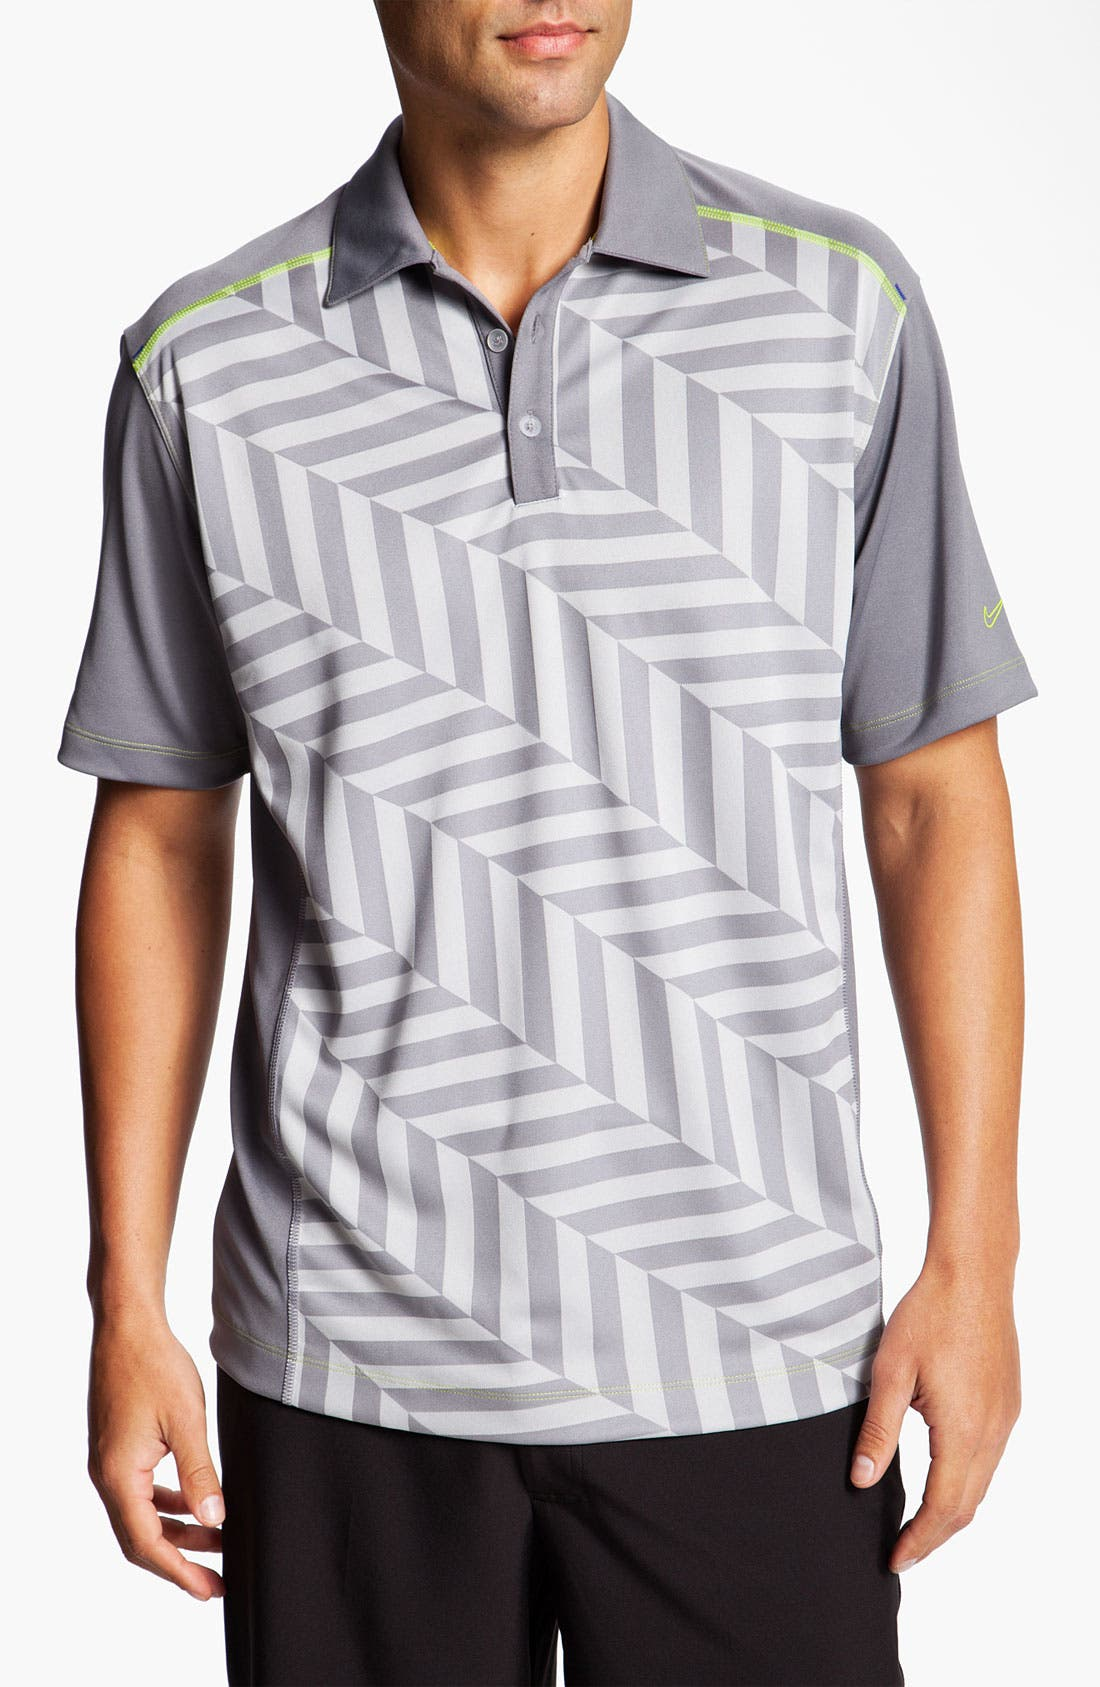 Main Image - Nike Golf 'Herringbone Jacquard' Dri-FIT Polo